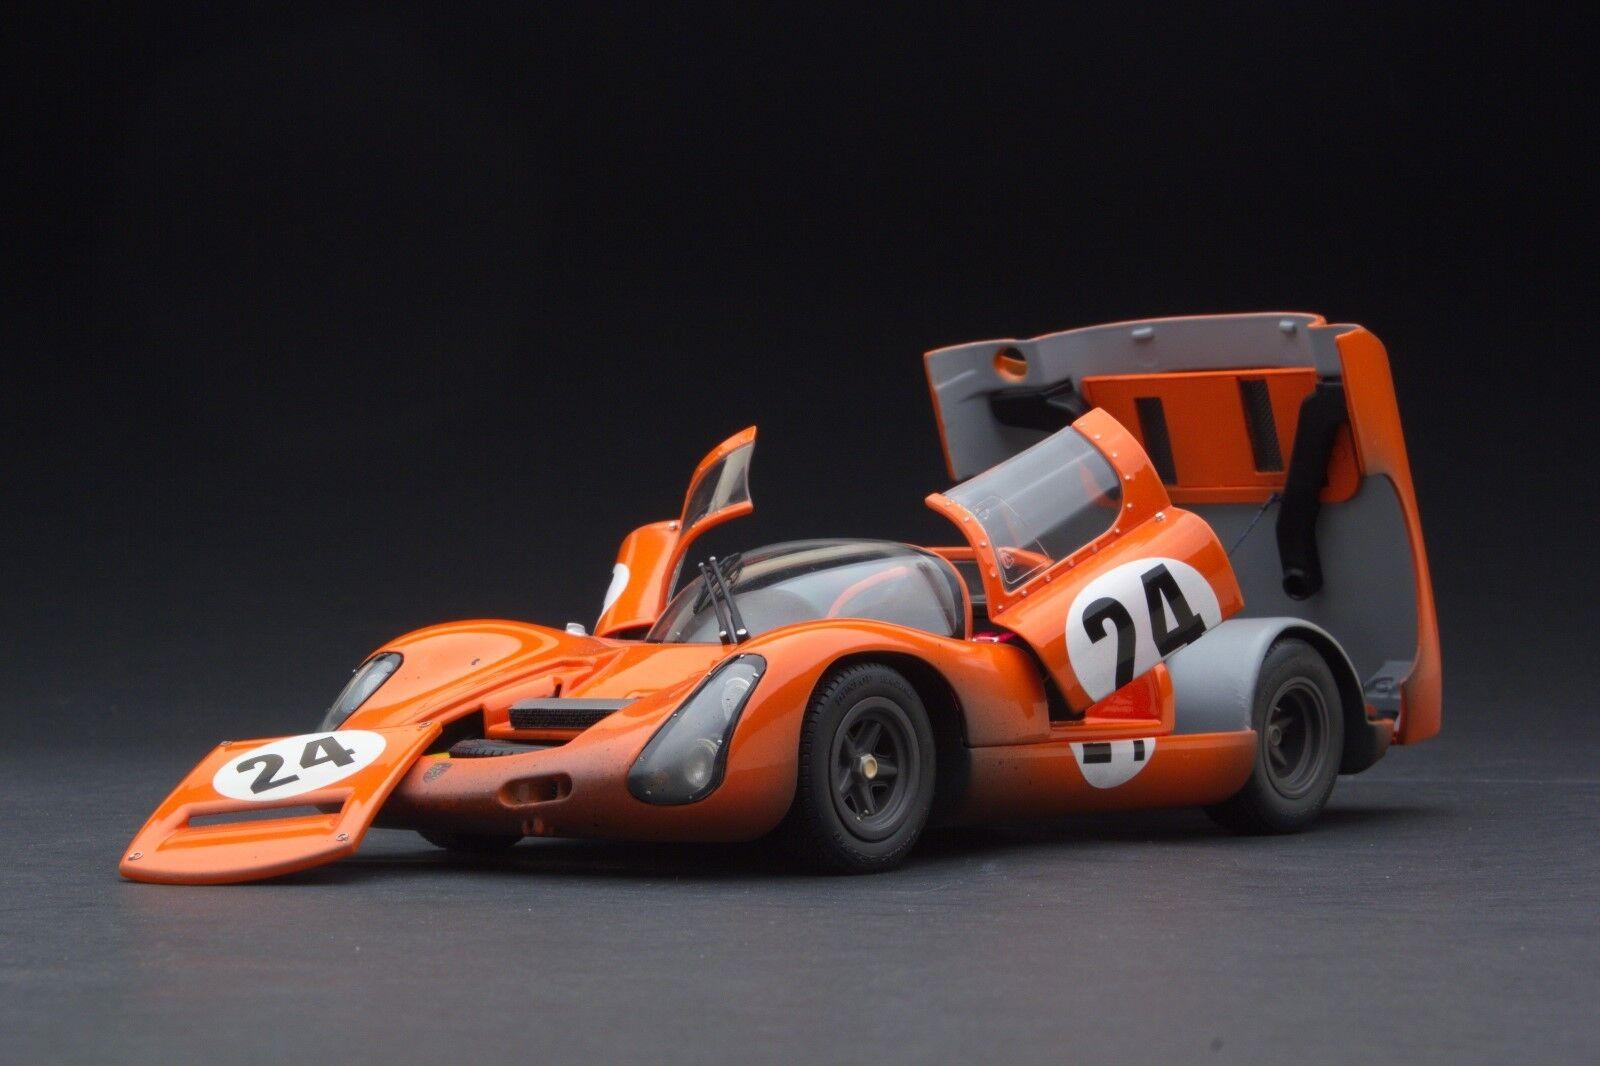 RACE WEATHERED Exoto 1966 Porsche 910 Hill Climb 1 18 MTB00063CFLP